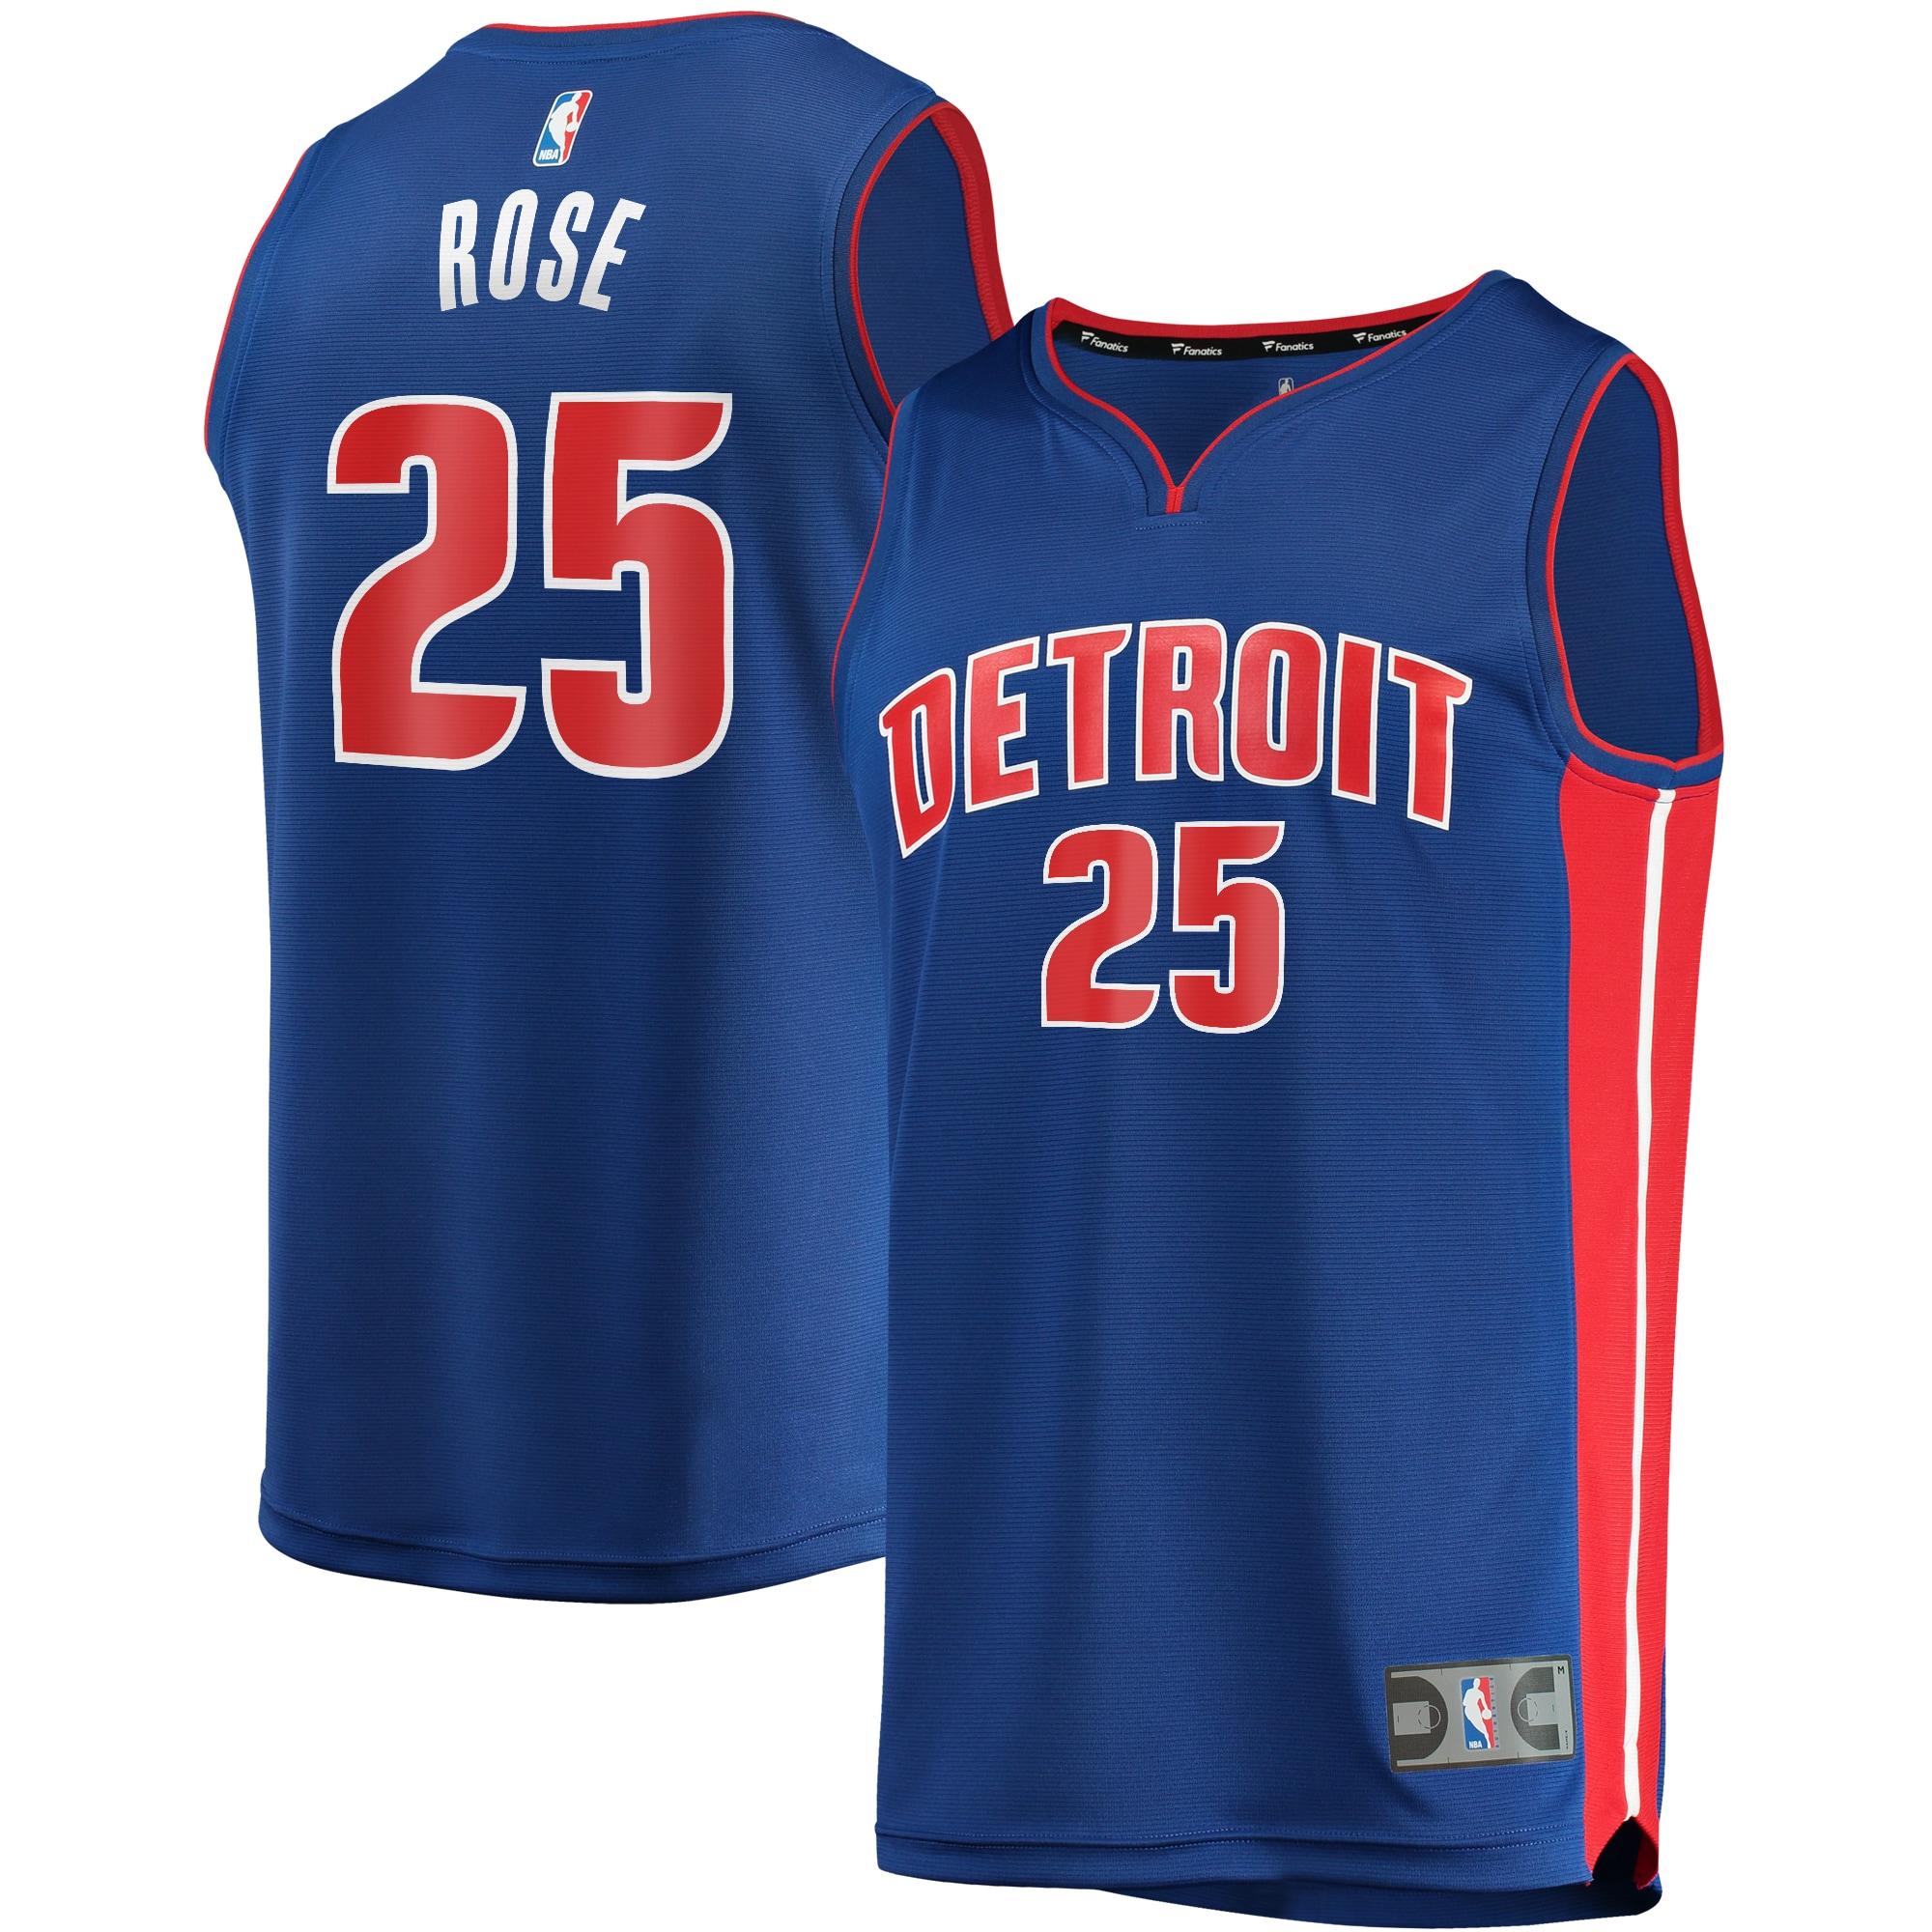 Derrick Rose Detroit Pistons Fanatics Branded Fast Break Replica Player Team Jersey - Icon Edition - Blue